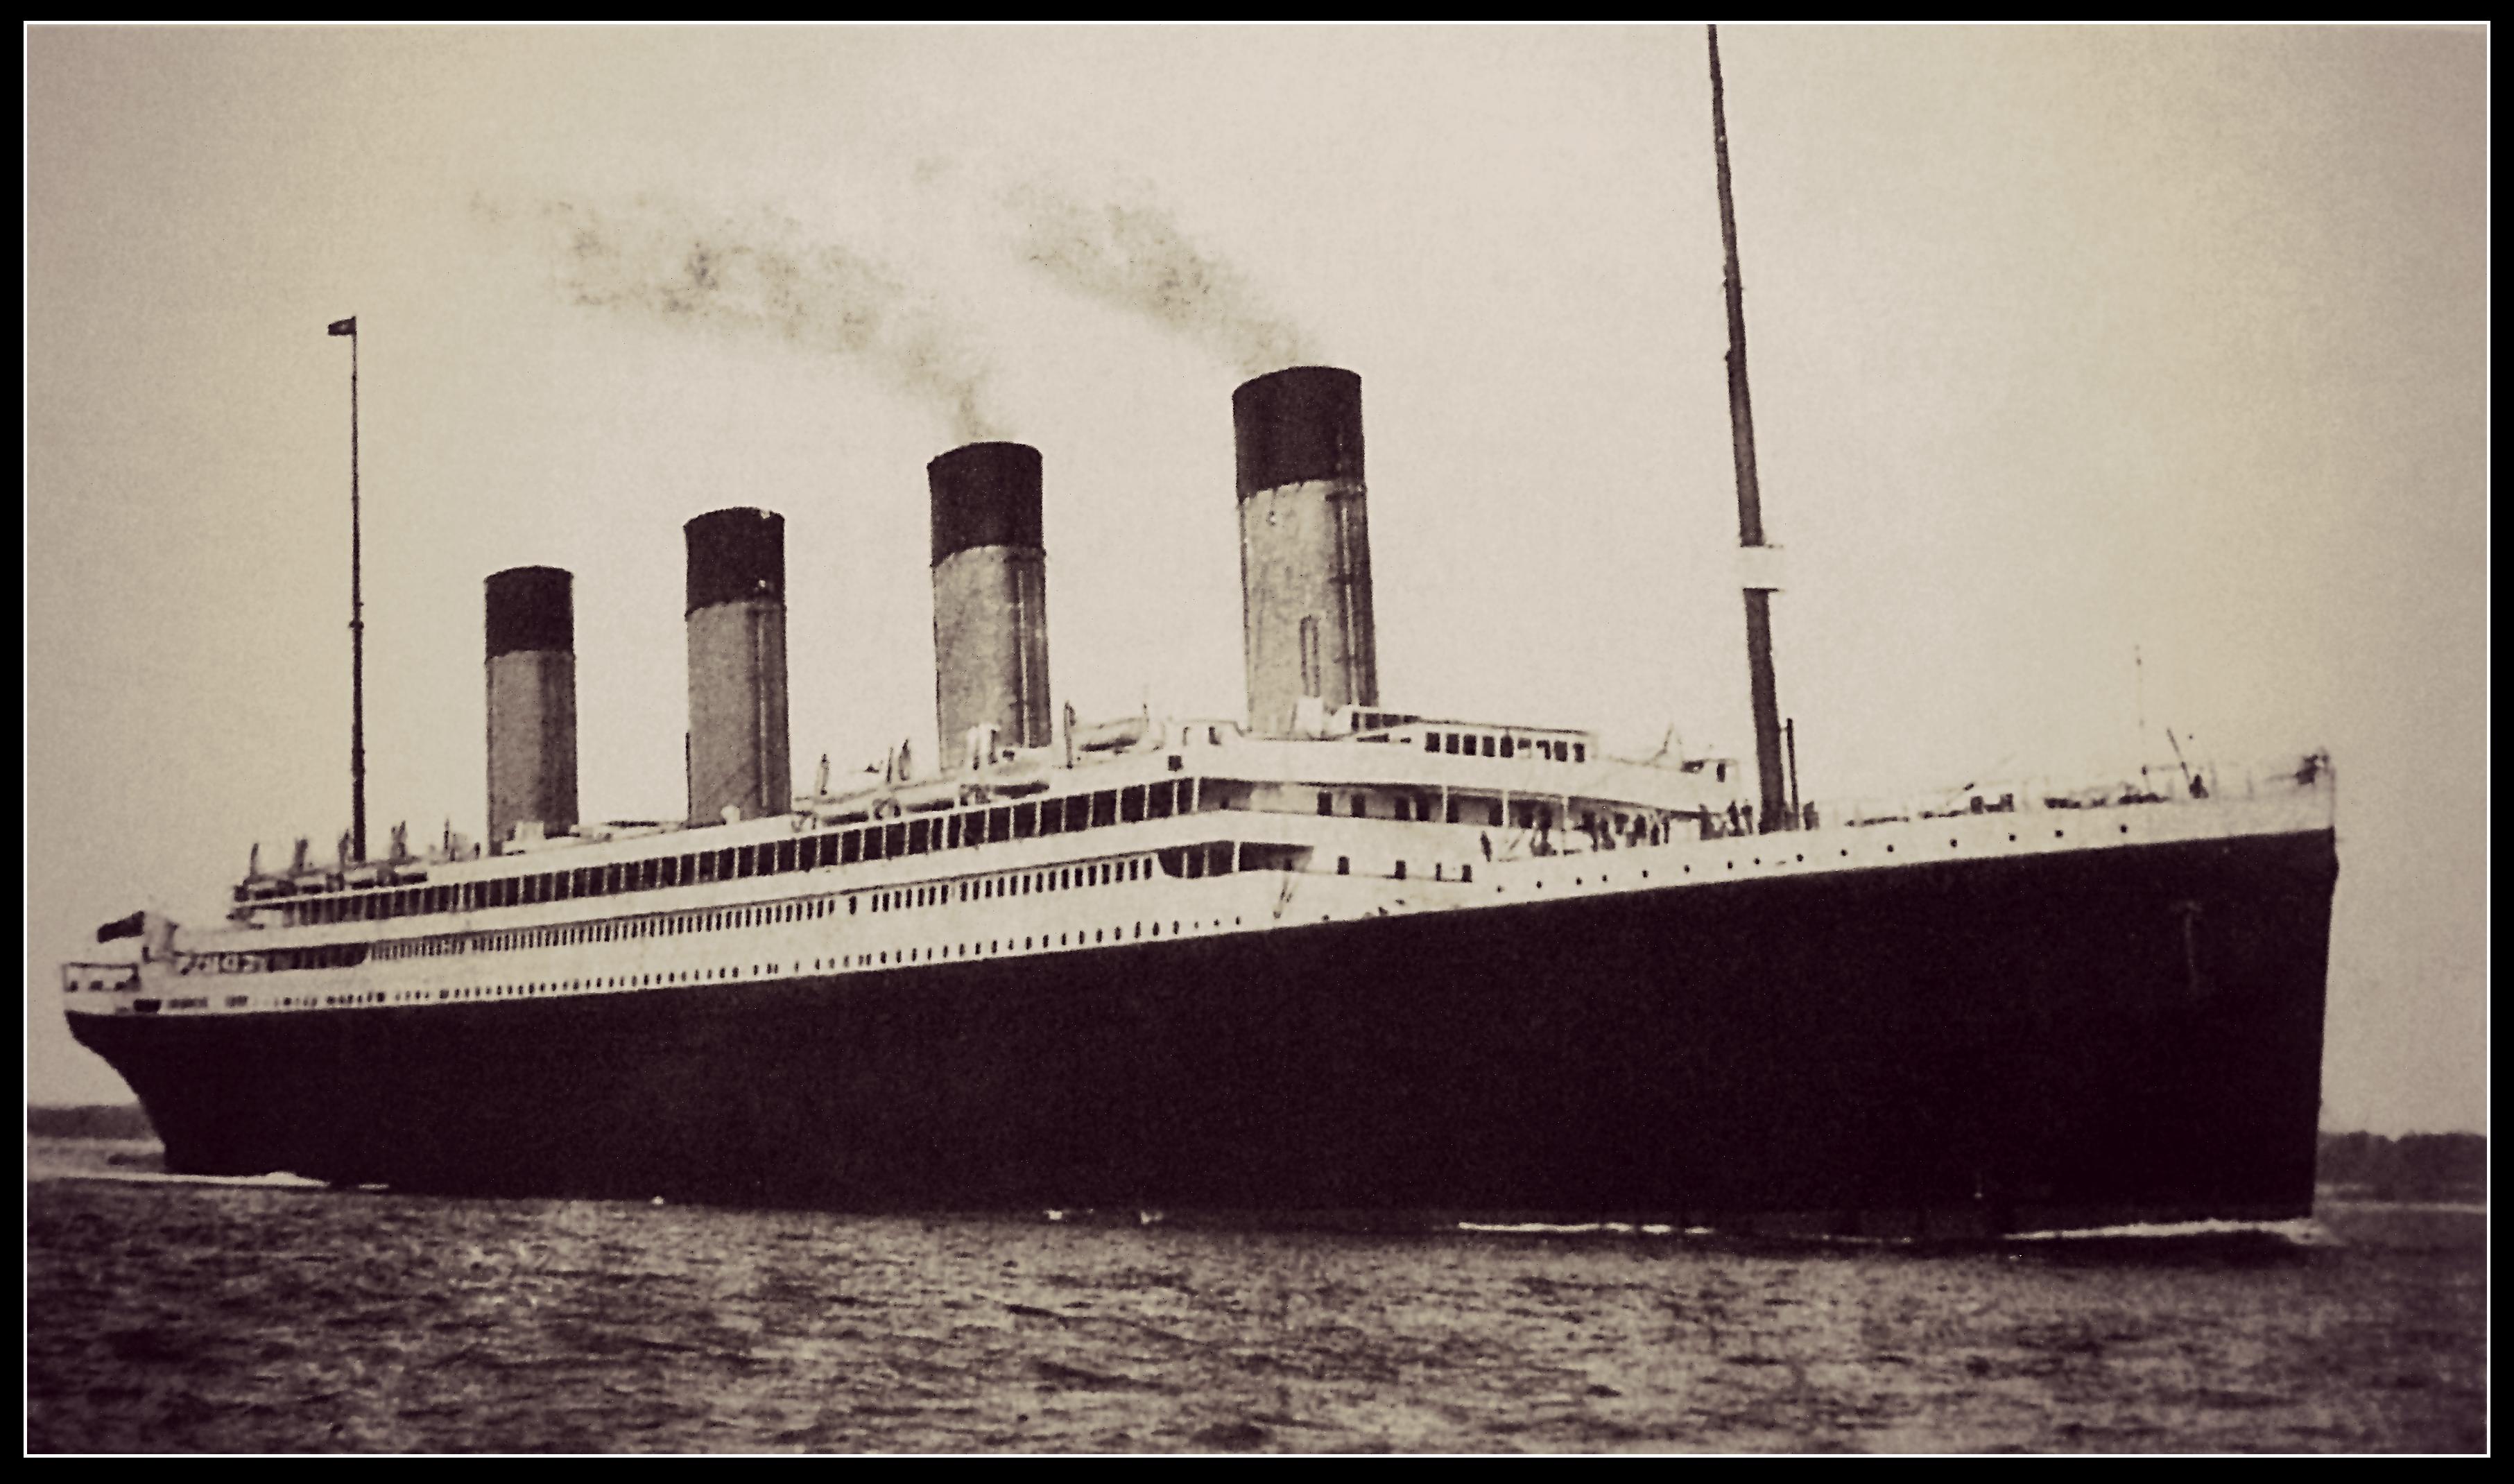 Shine on the Titanic